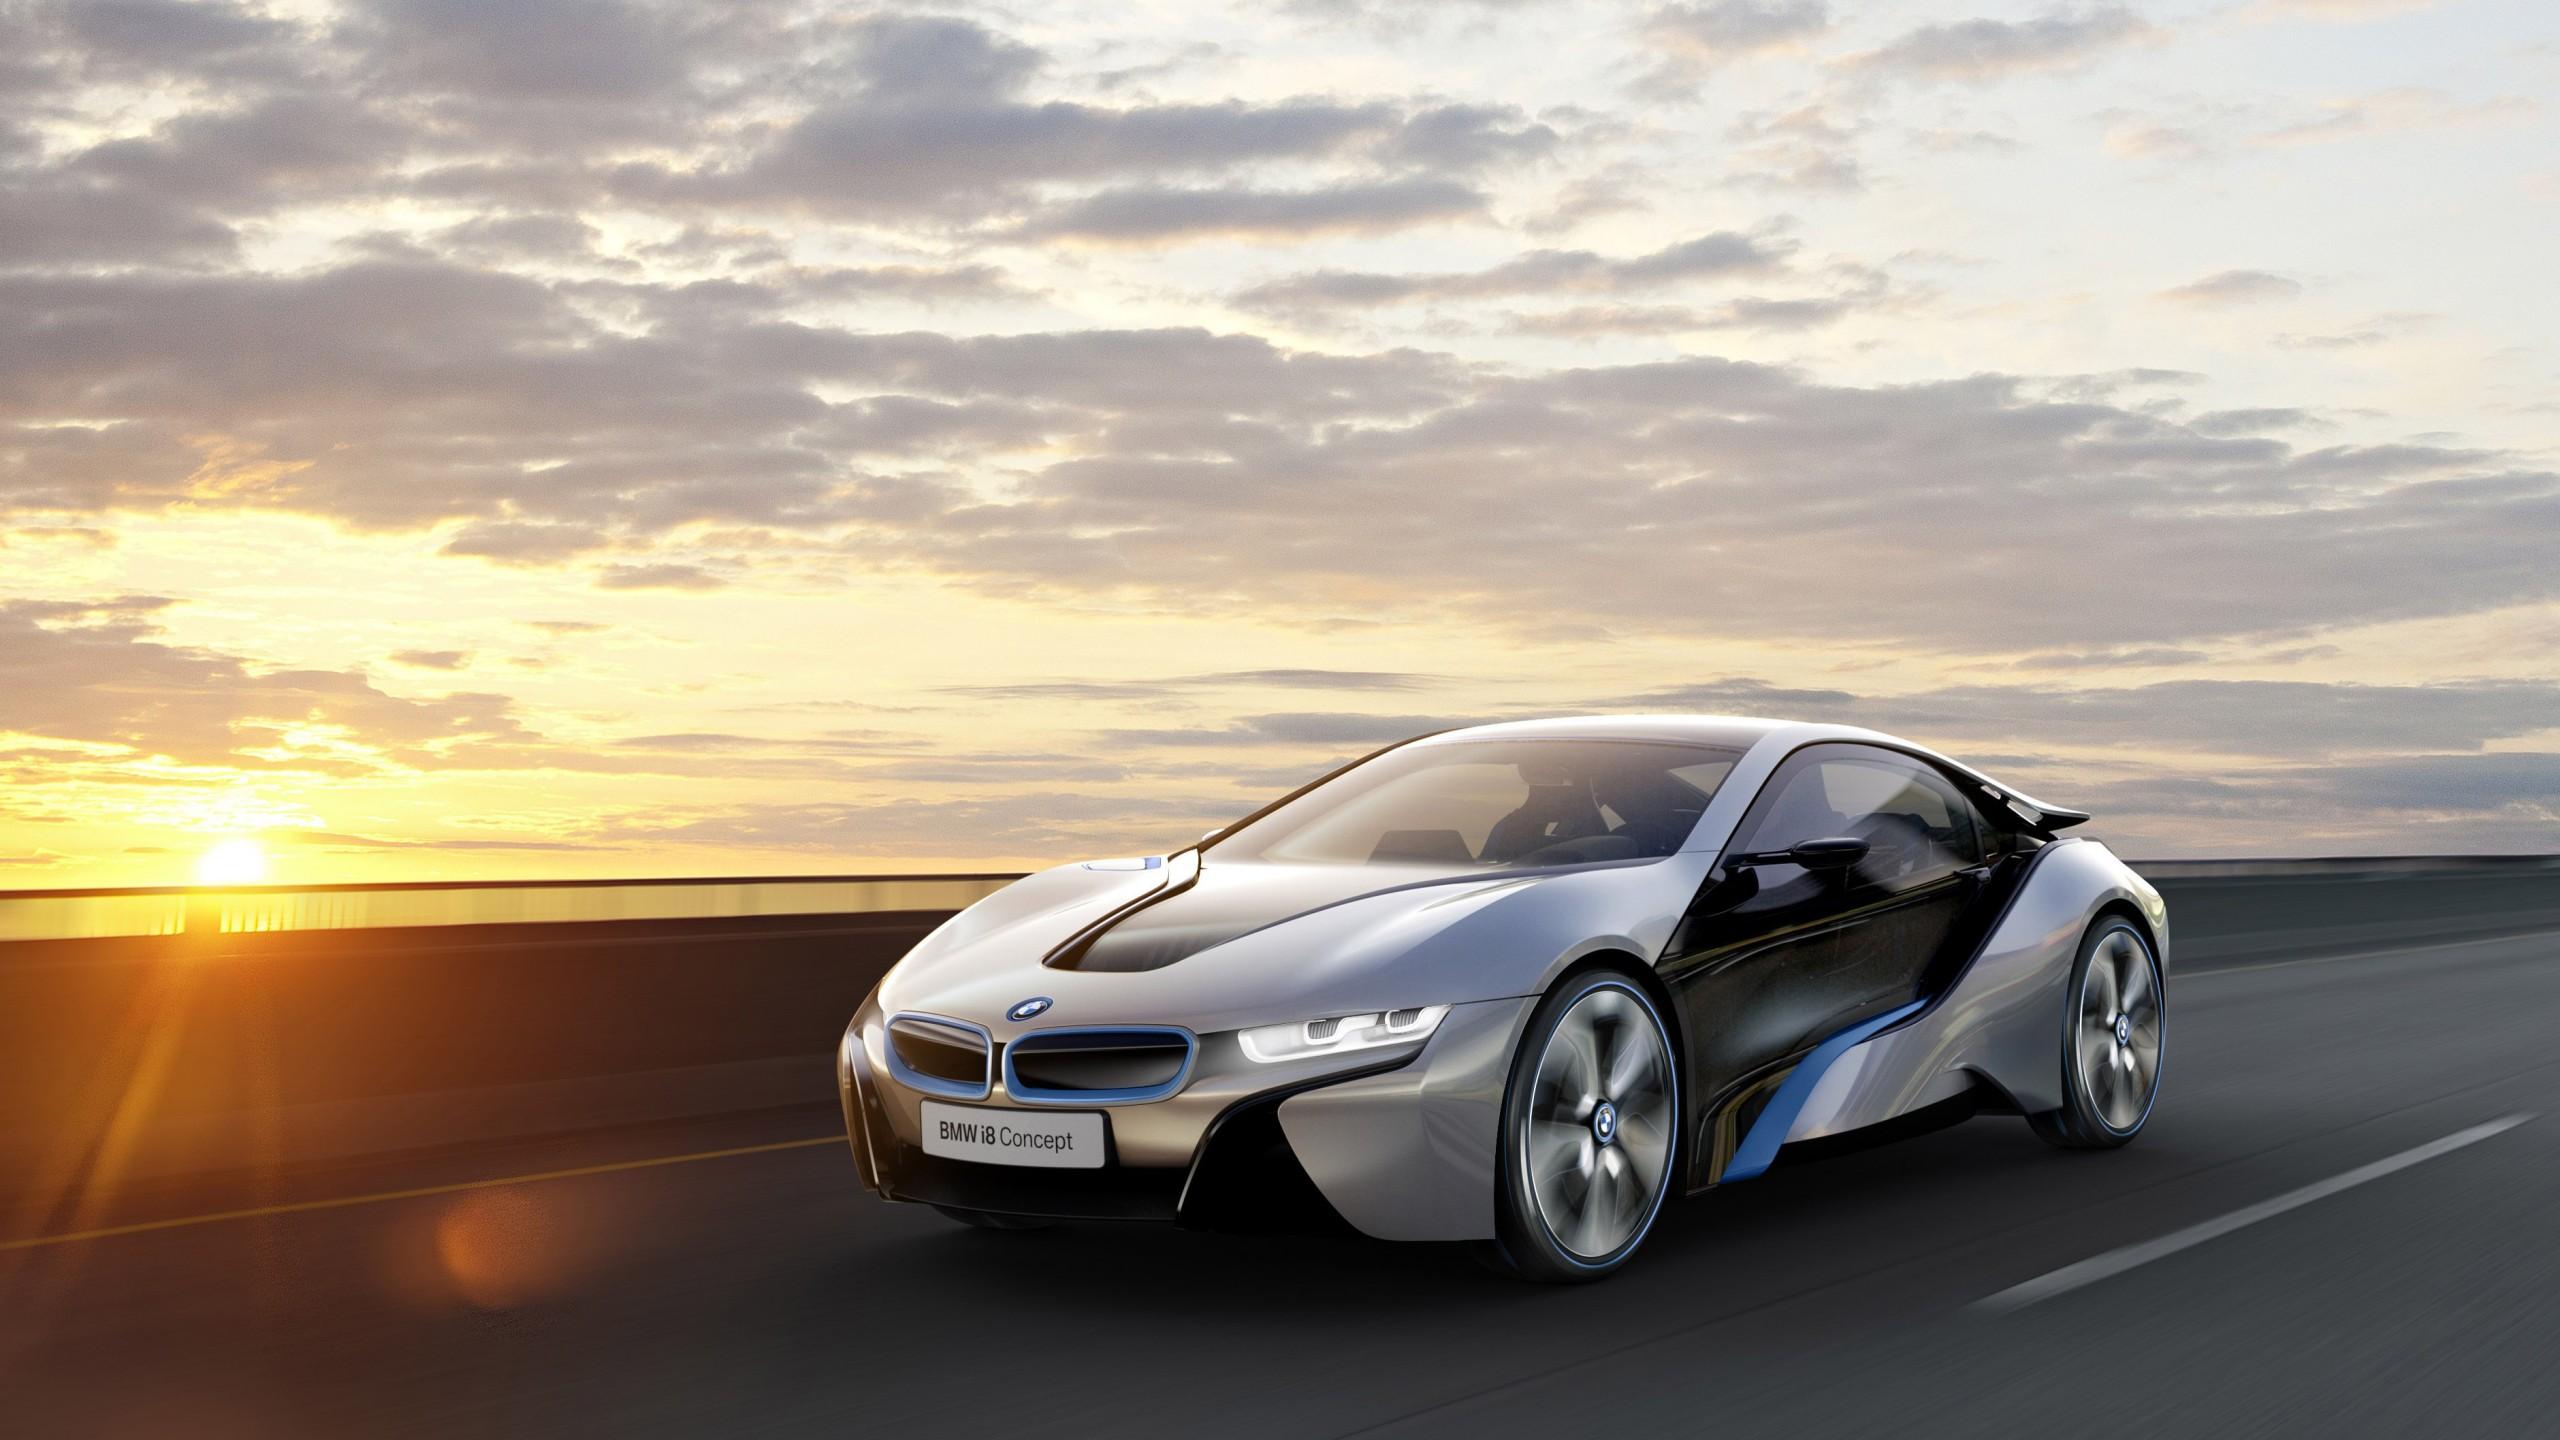 Wallpaper BMW i8 4k HD wallpaper electric cars MCV carbon 2560x1440